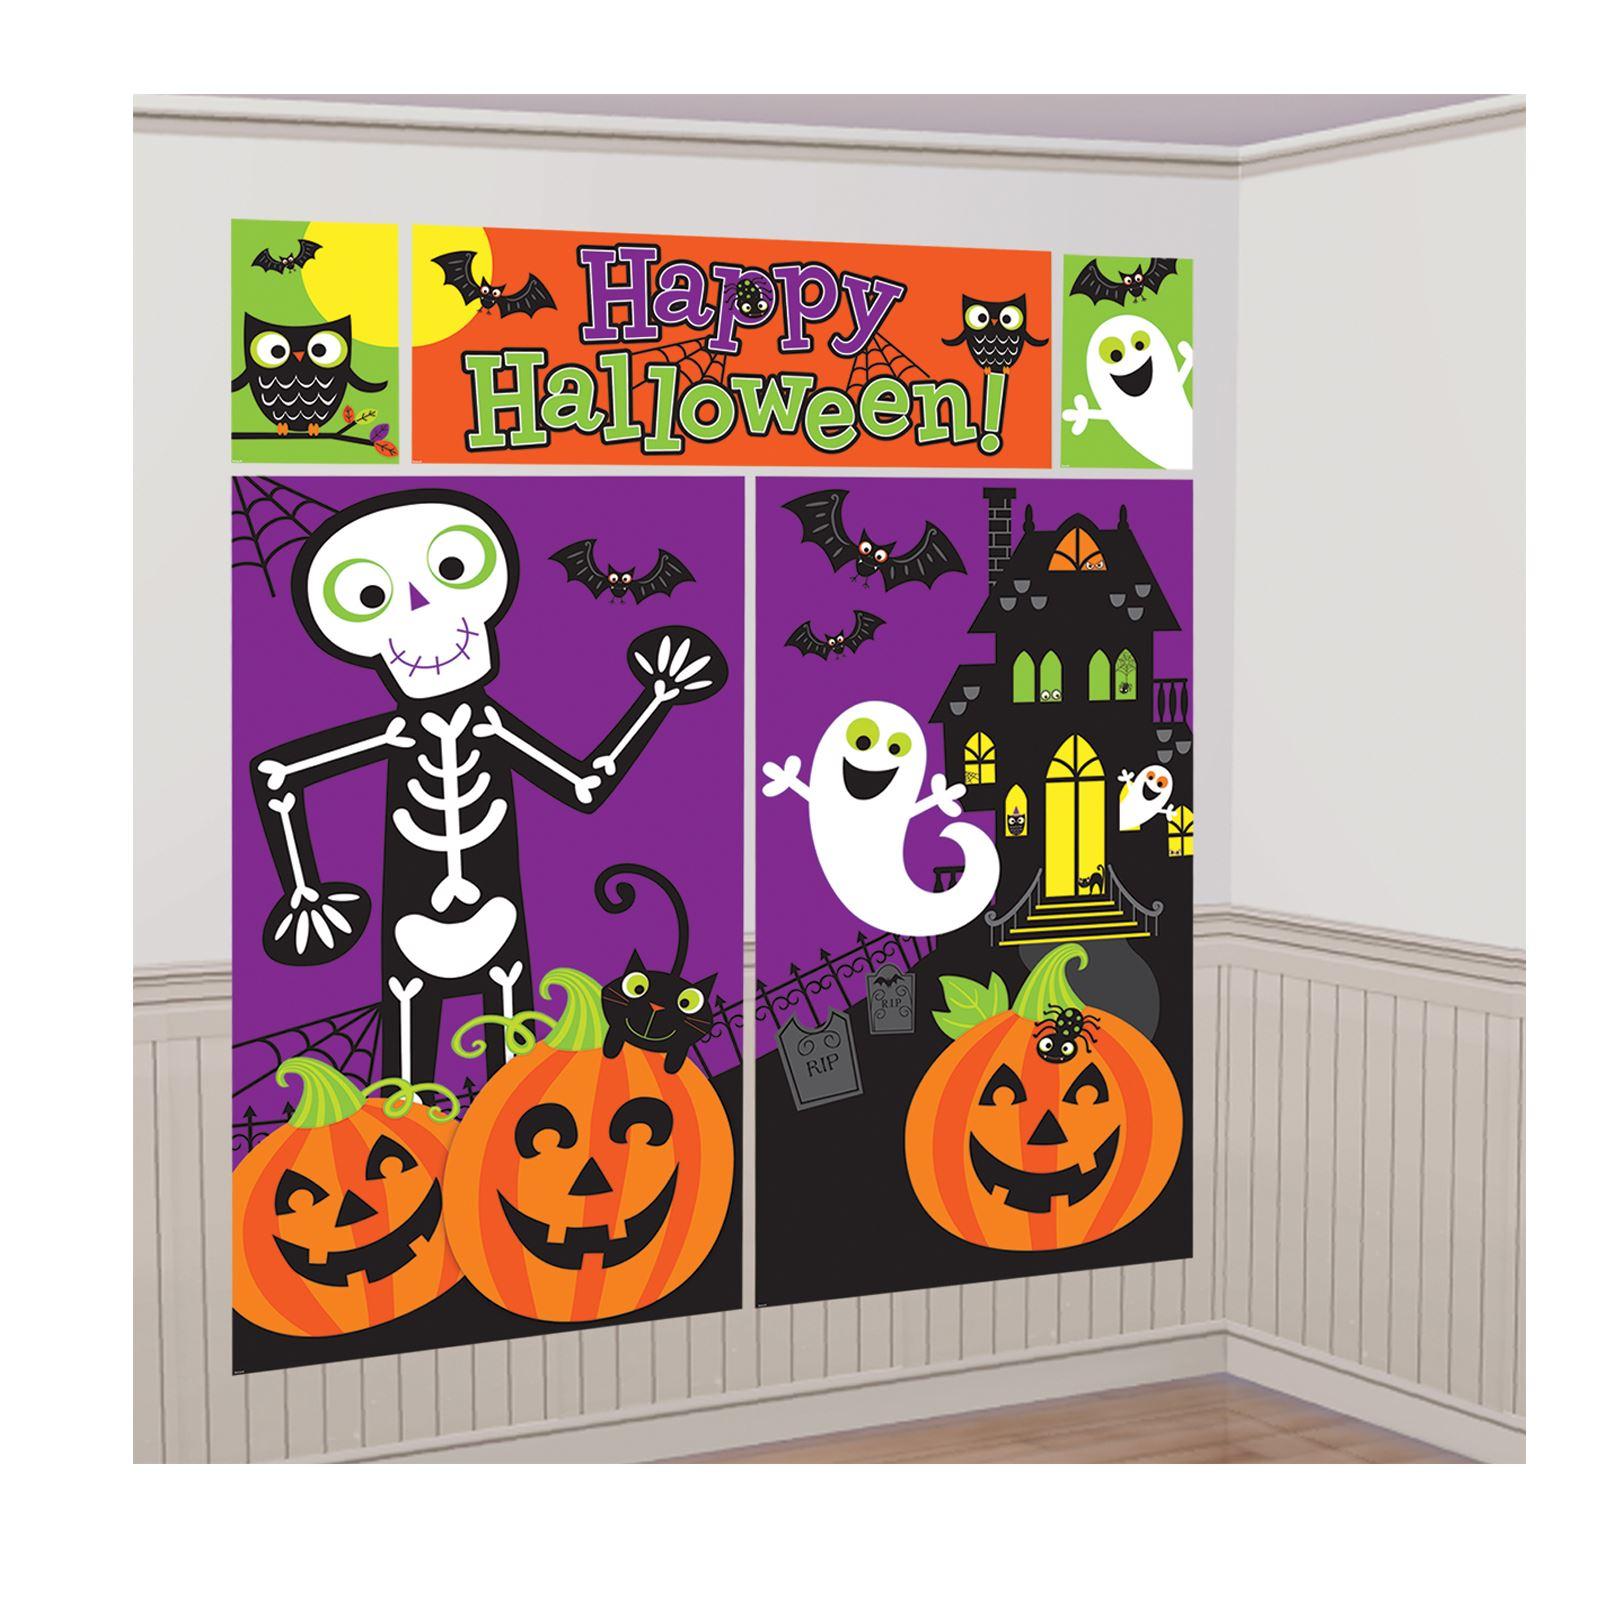 Details about Halloween freundlich Monster Scene Setters BACKDROP Wall Raumdekoration Kinder